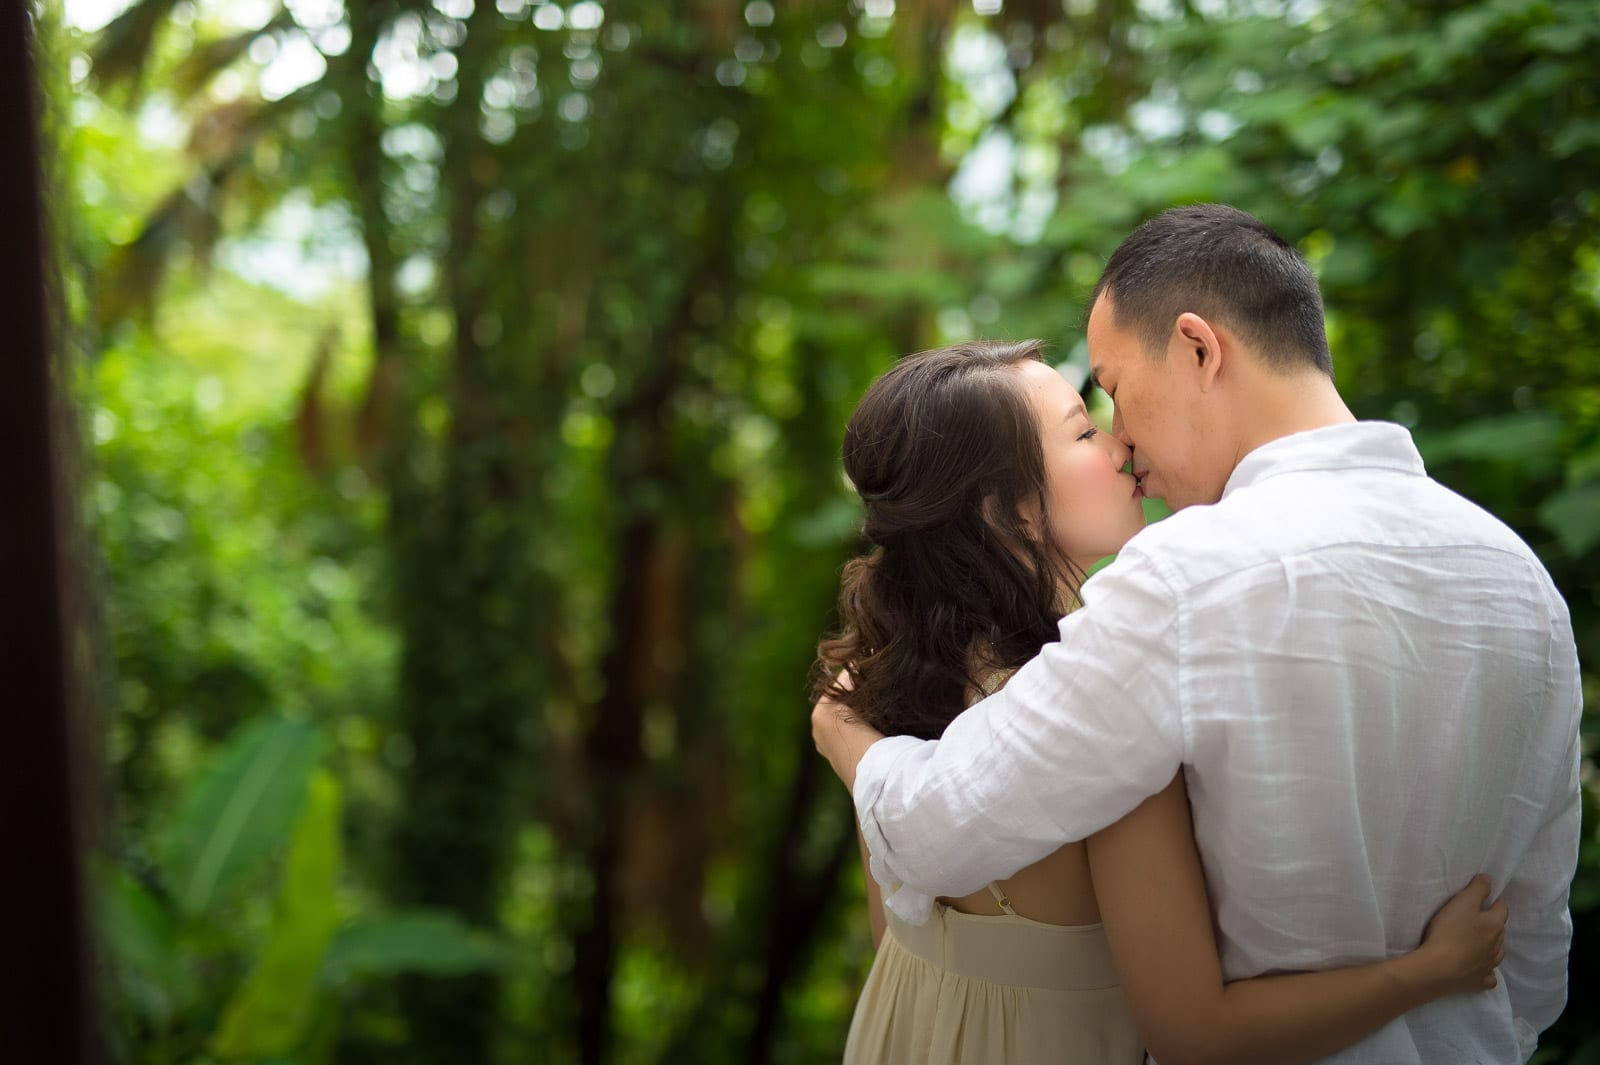 phuket-prewedding-photographer-thailand-wedding-photography-021